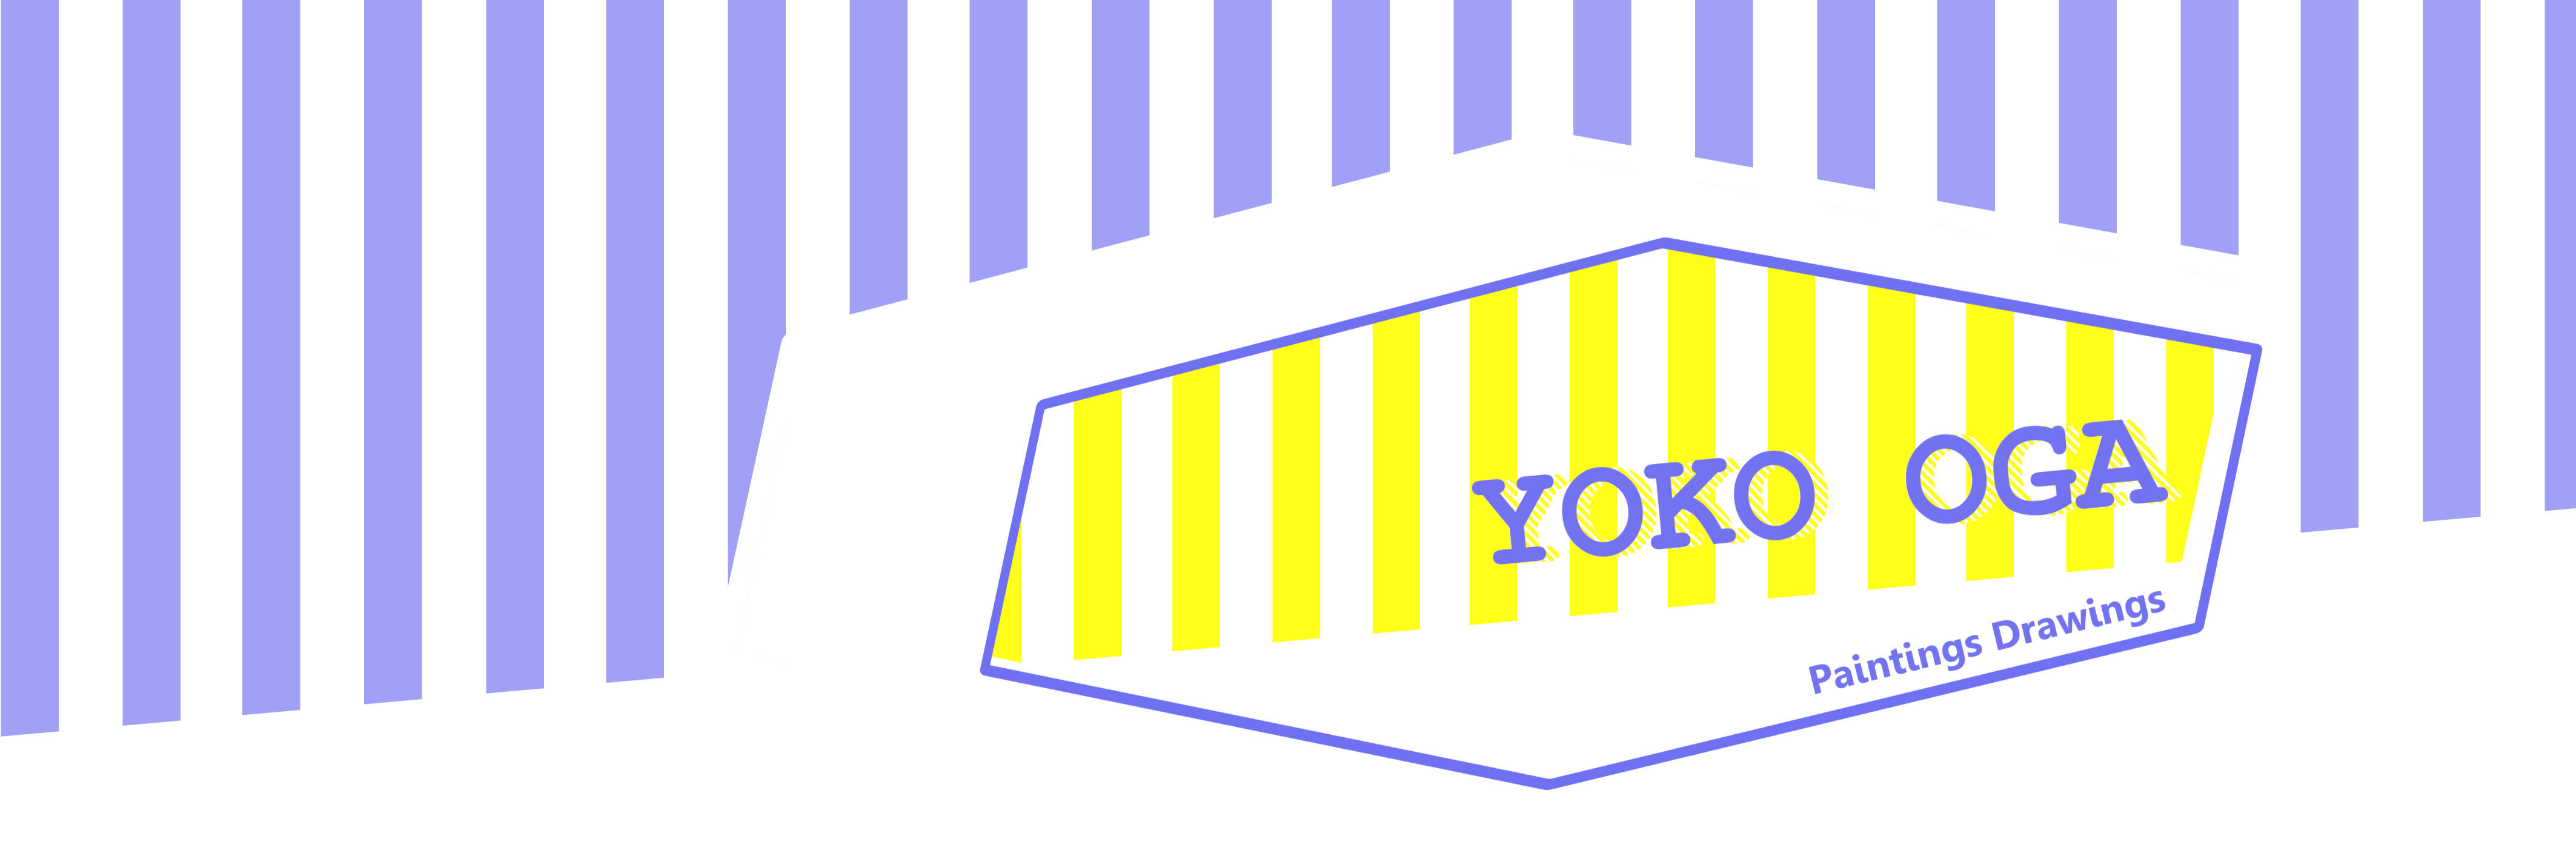 YOKO OGA